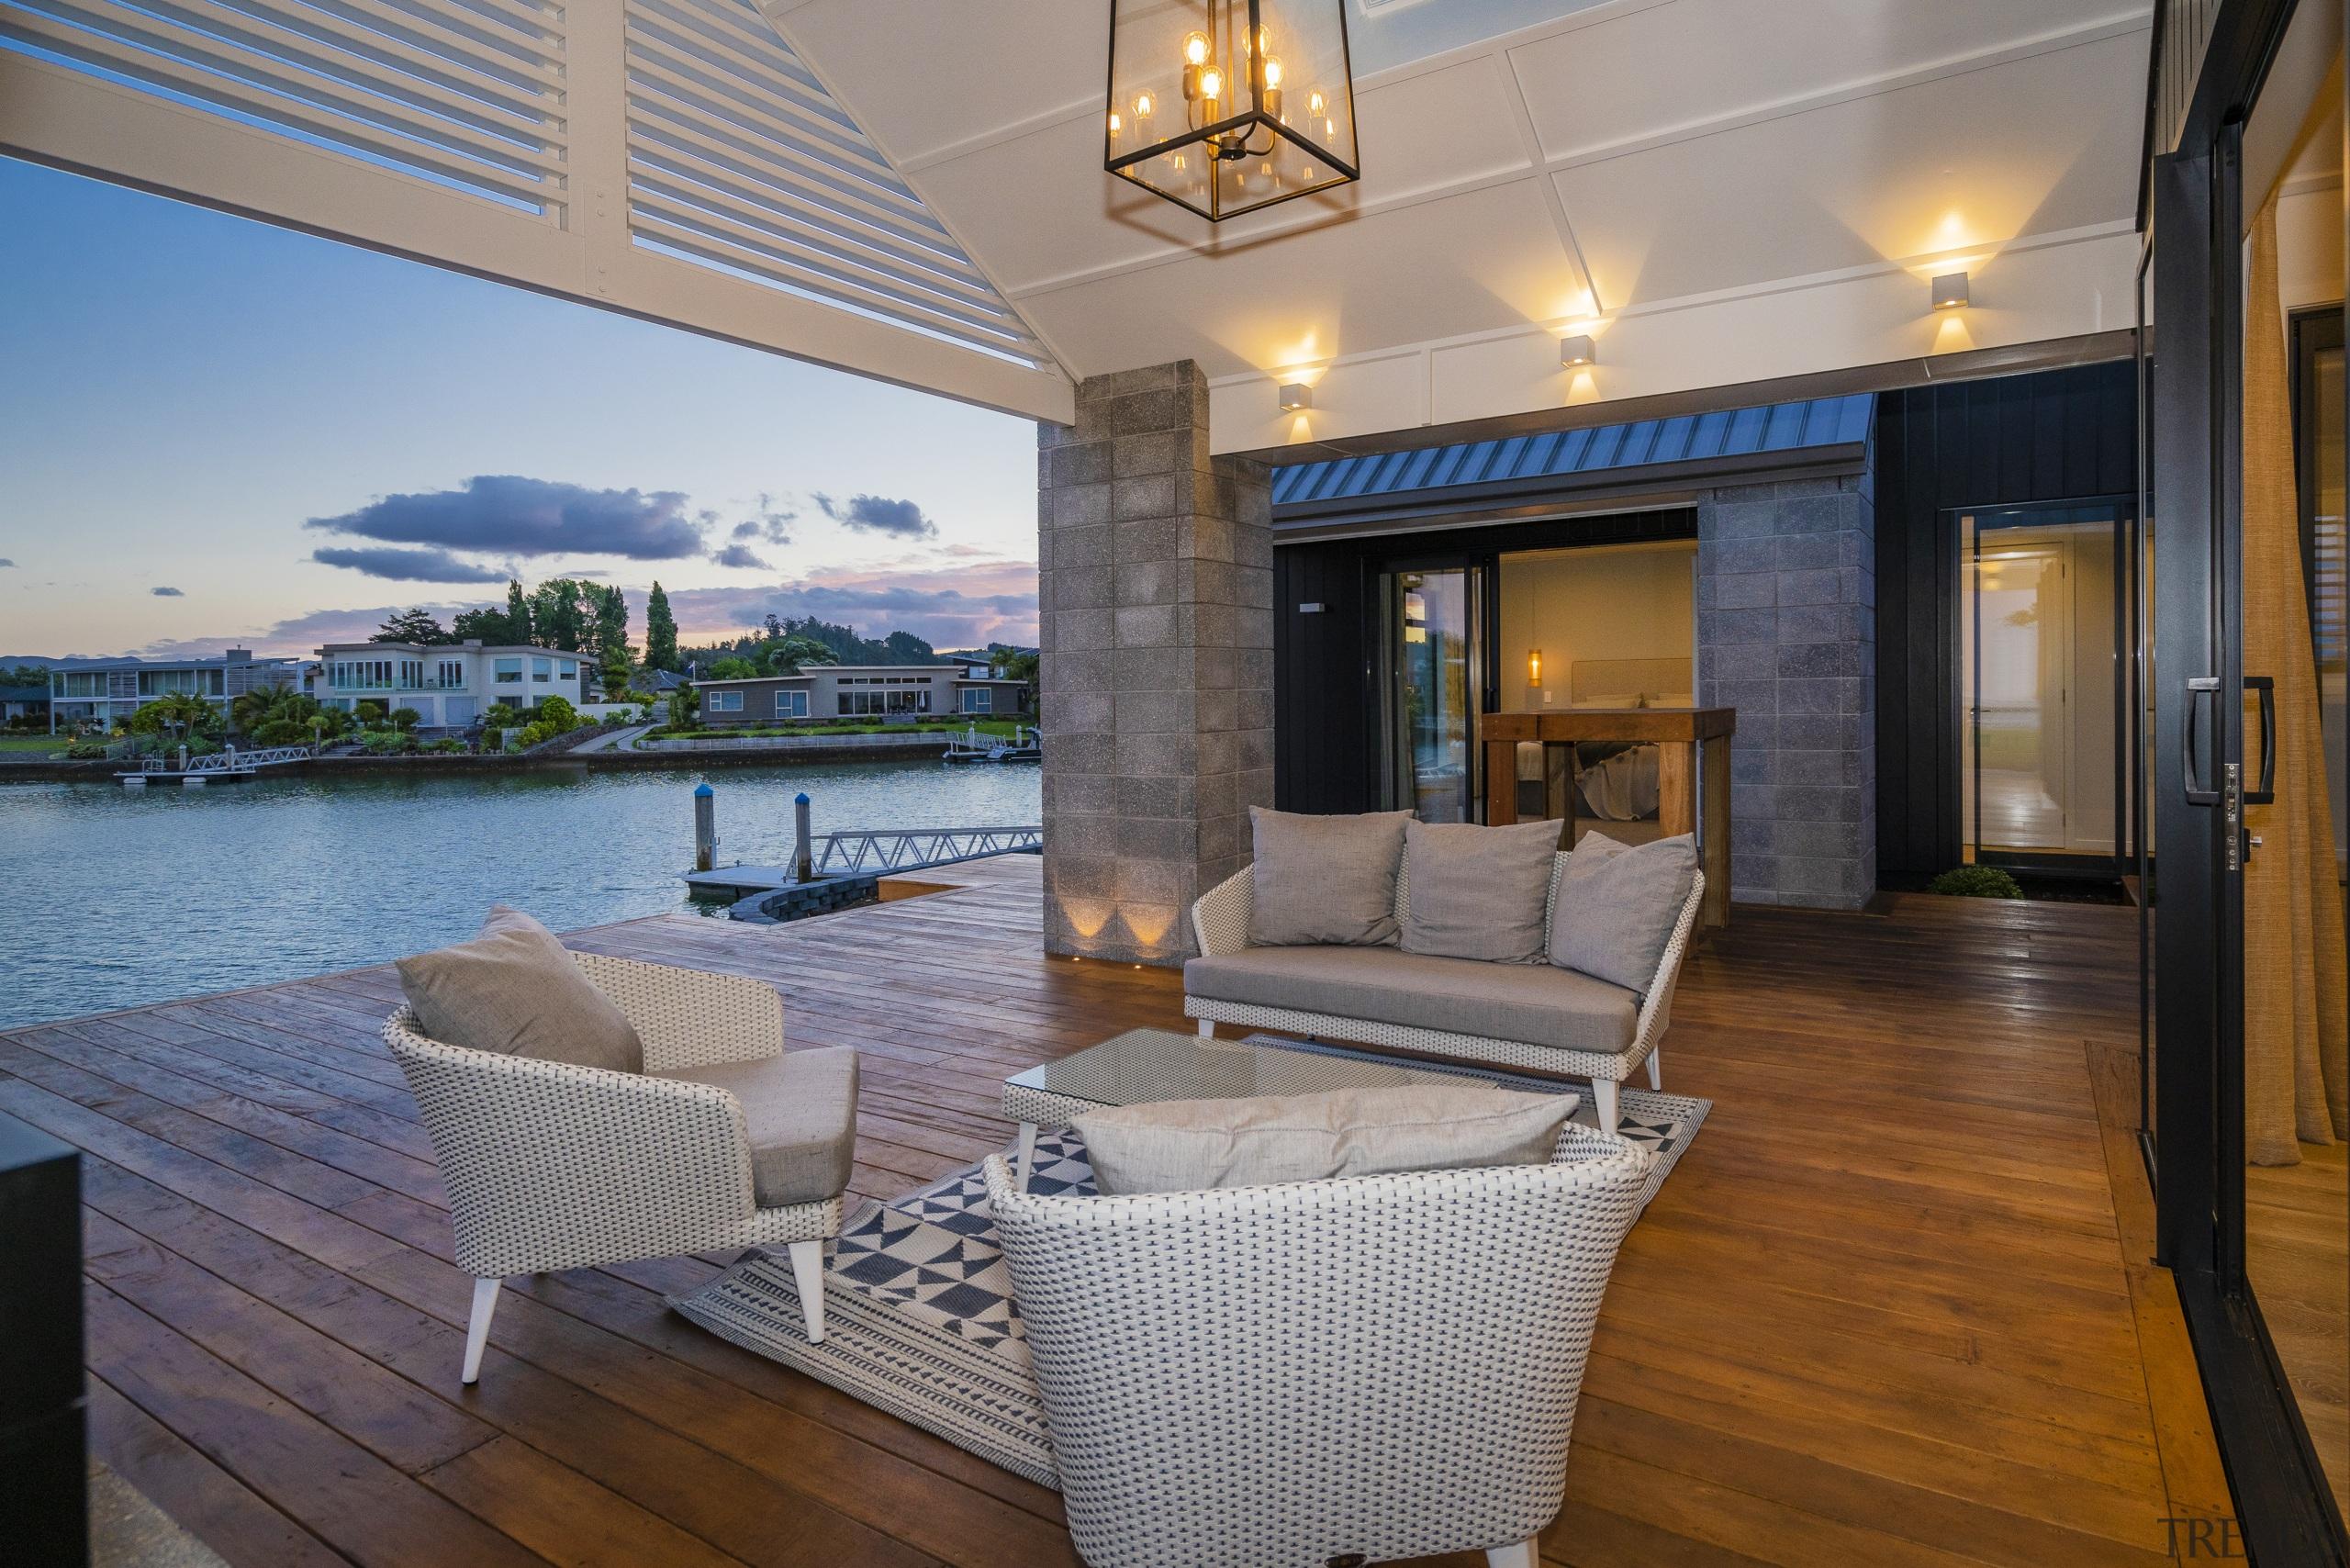 On Landmark Home's Coromandel house design, the expansive deck, home, interior design, patio, real estate, showhome, landmark homes, timber deck, covered pavilion